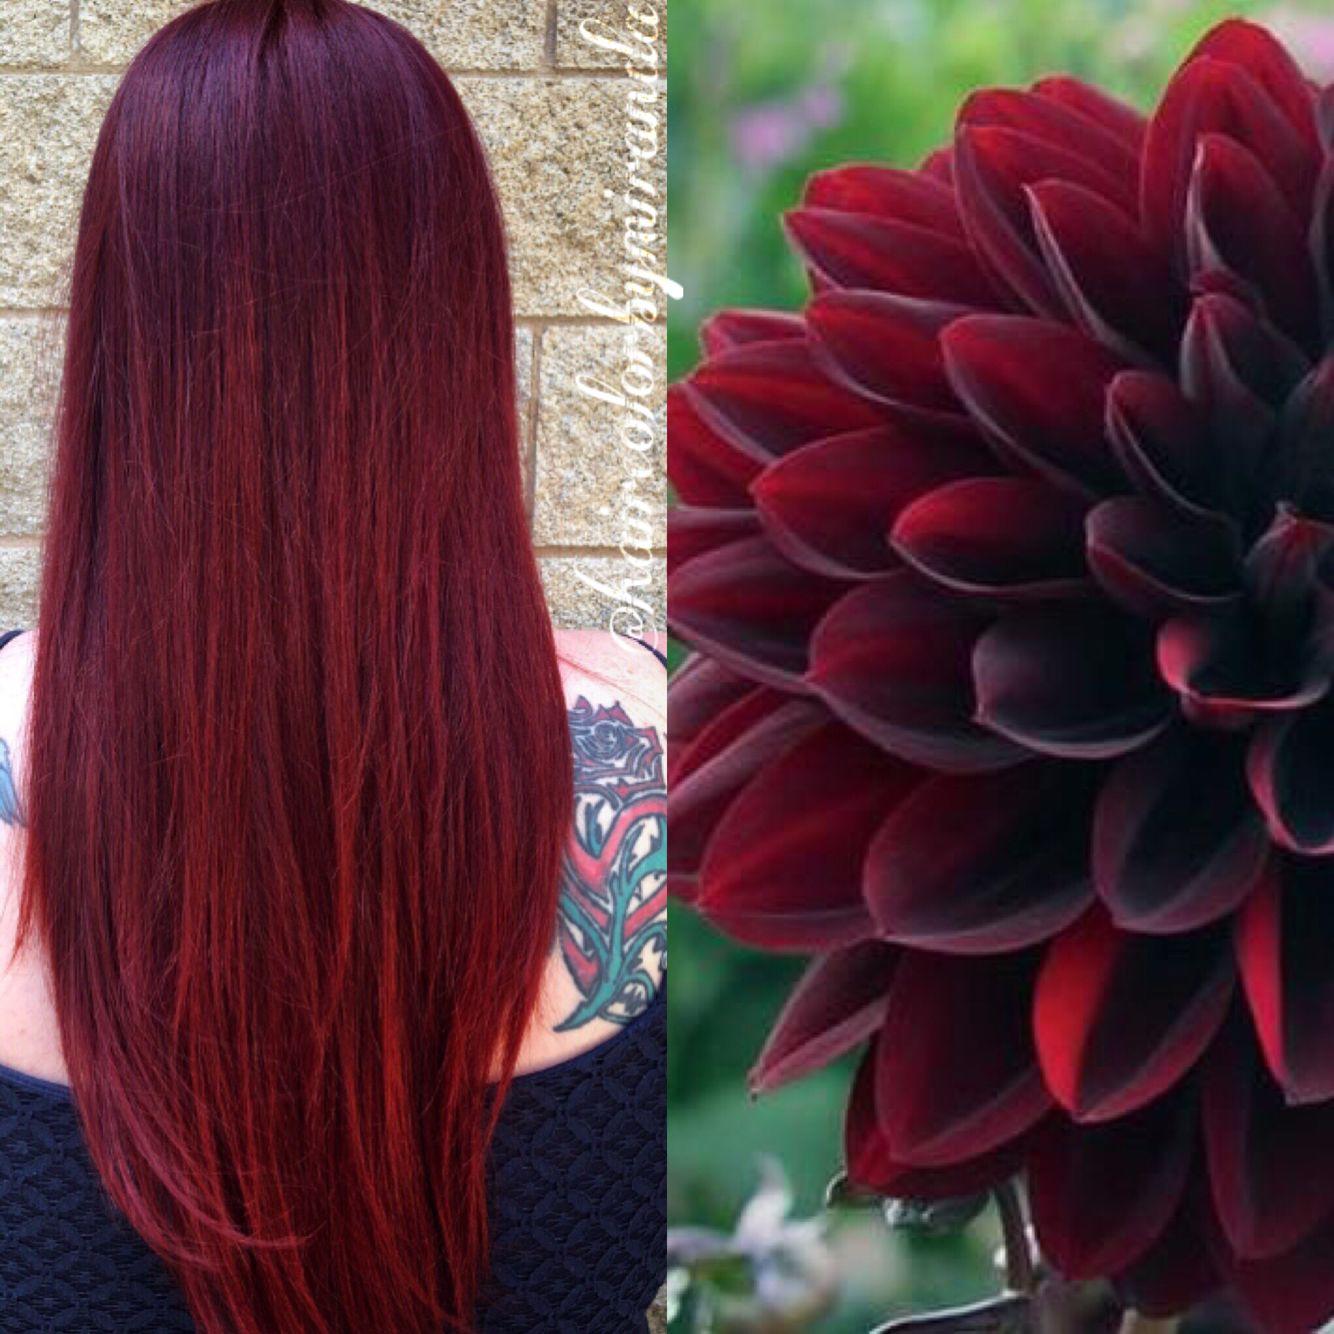 Burgundy Henna Hair Dye: Red Burgundy Maroon Long Hair Color By @haircolorbymiranda